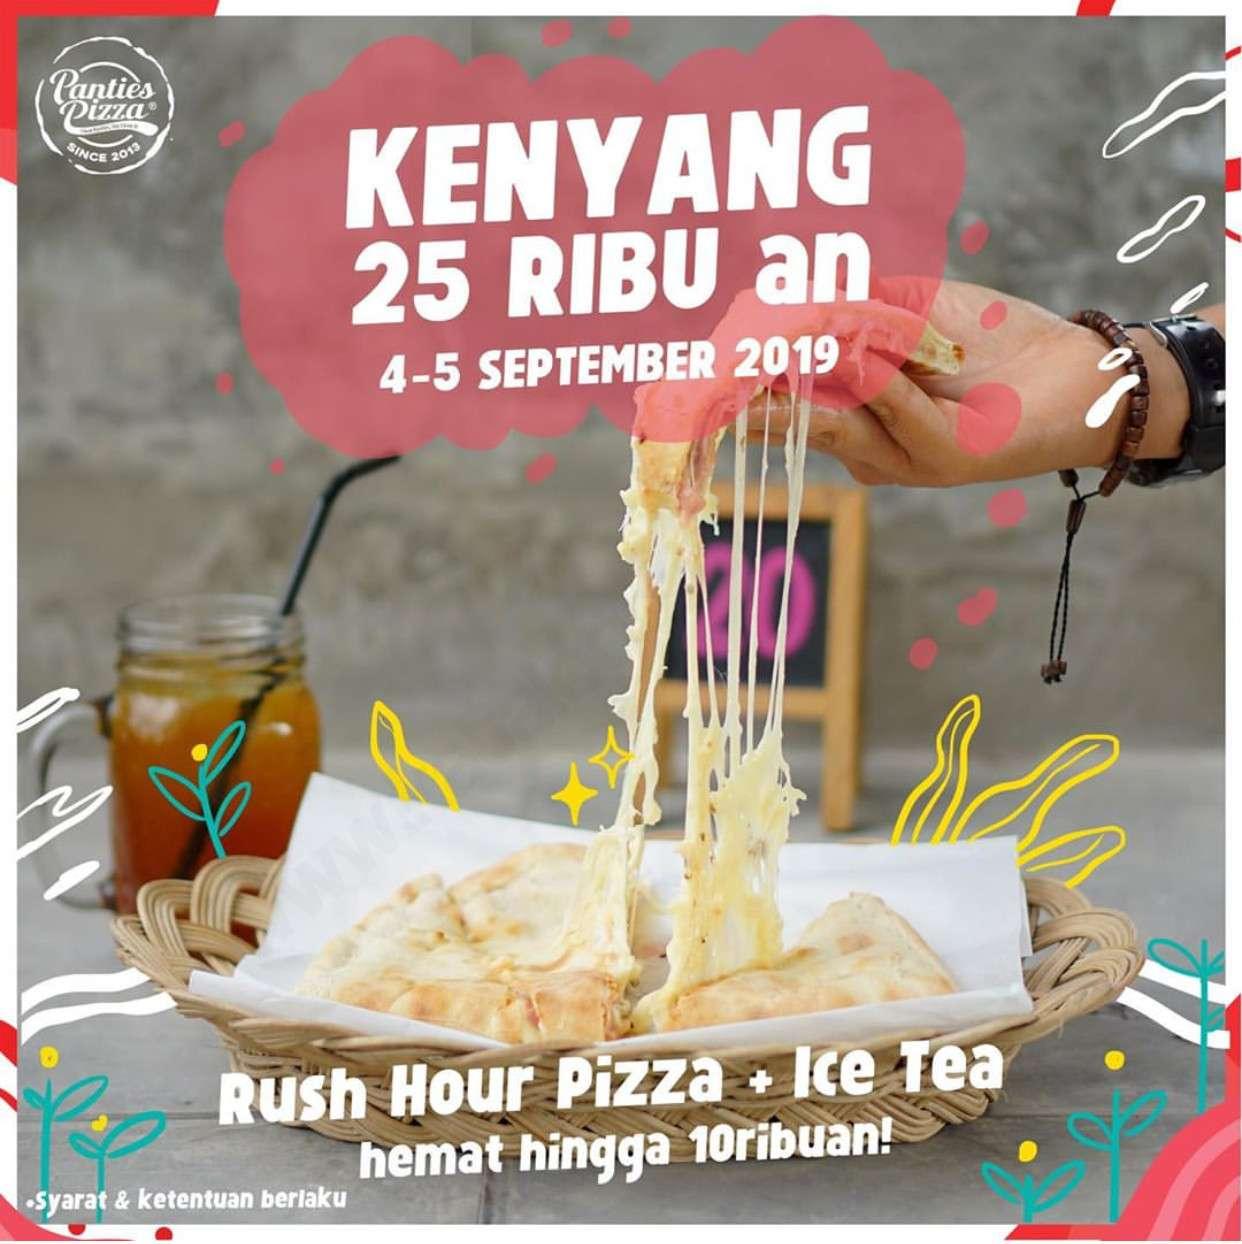 Panties Pizza Promo Paket Rush Hour Pizza + Ice Tea hanya Rp 25ribuan aja